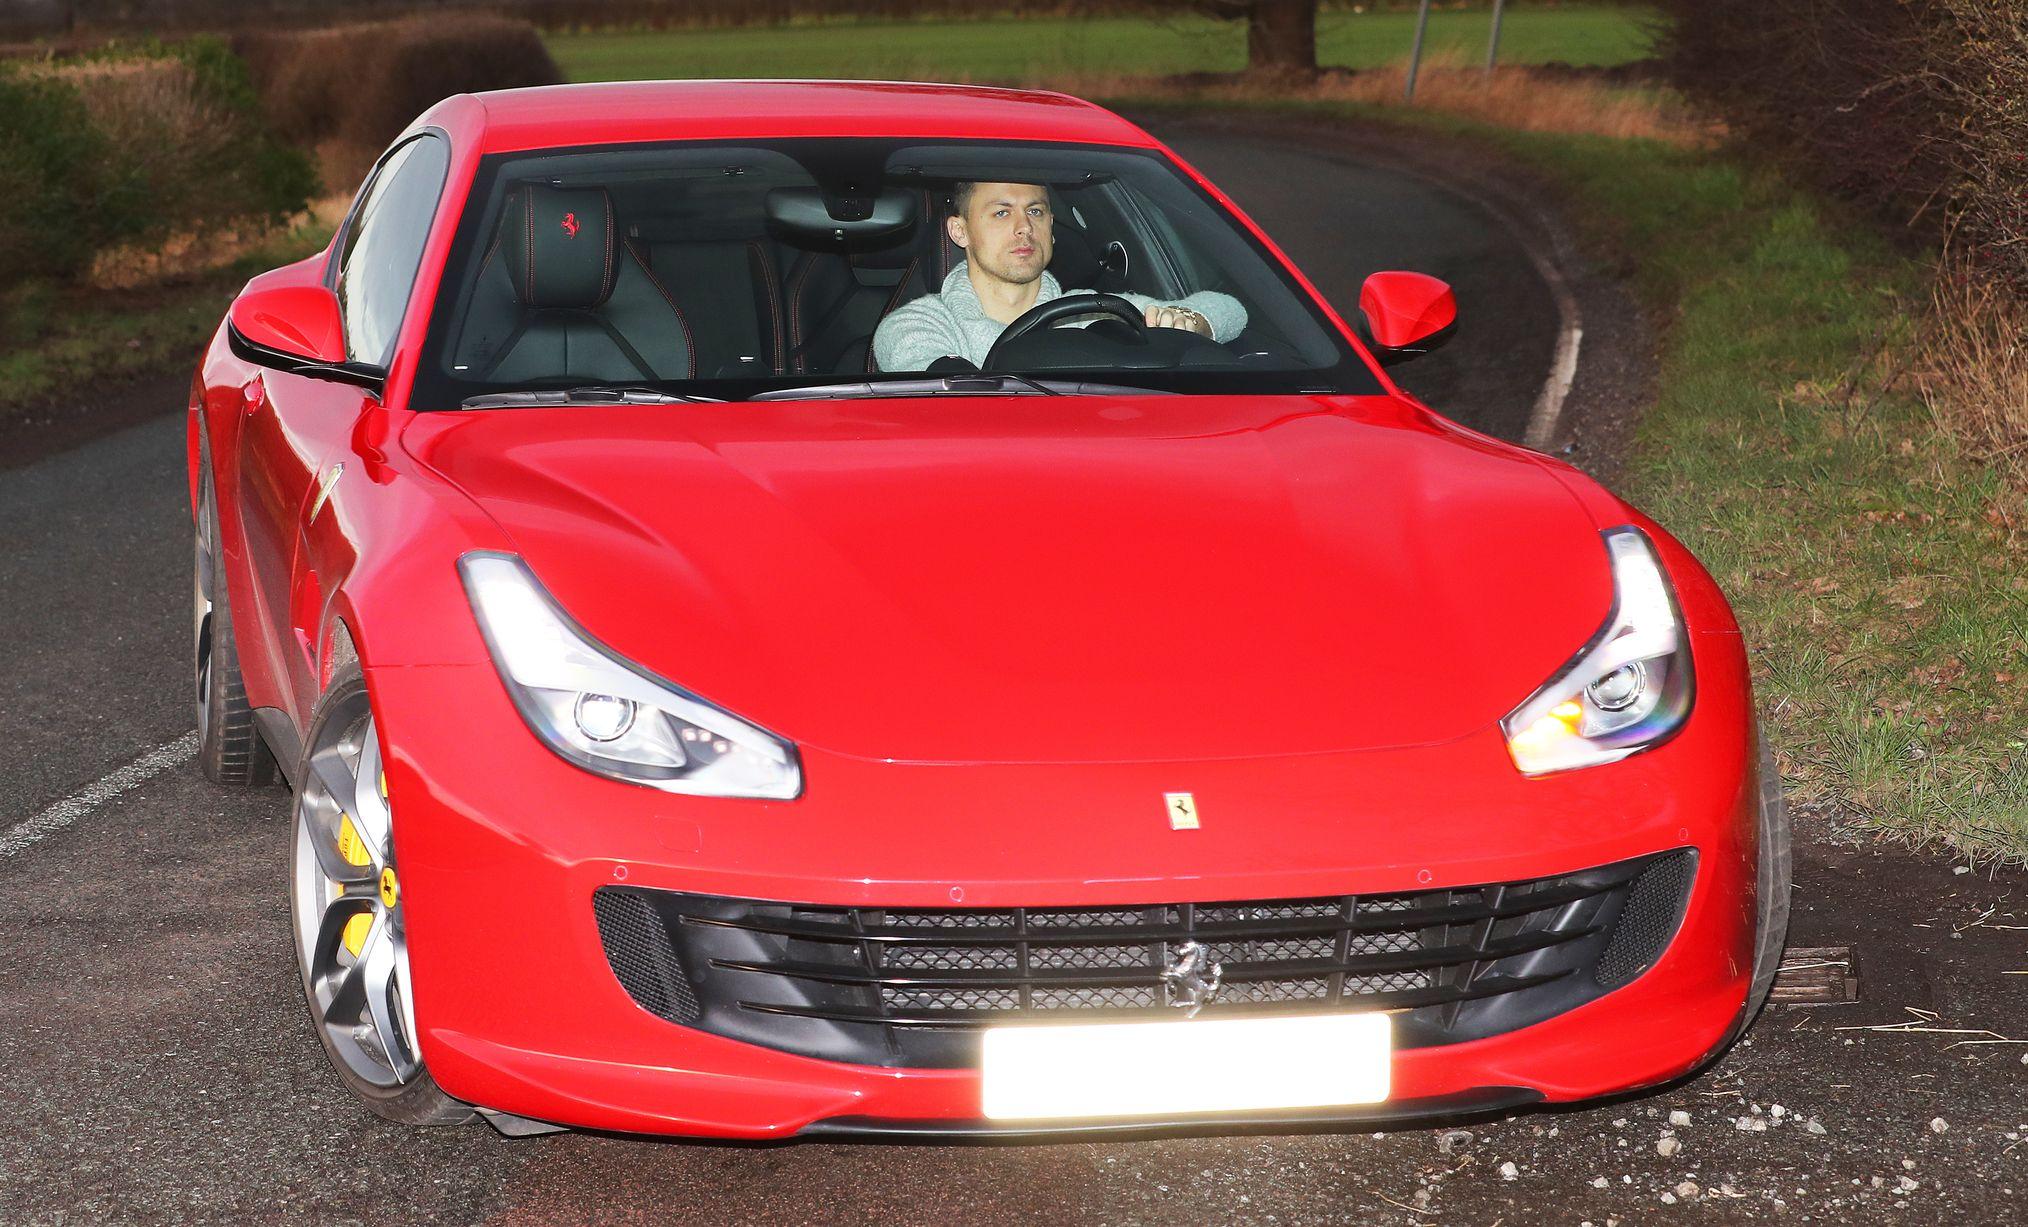 Marcus Rashford arrives at Manchester United training ground after injury blow - Ảnh - Bóng Đá